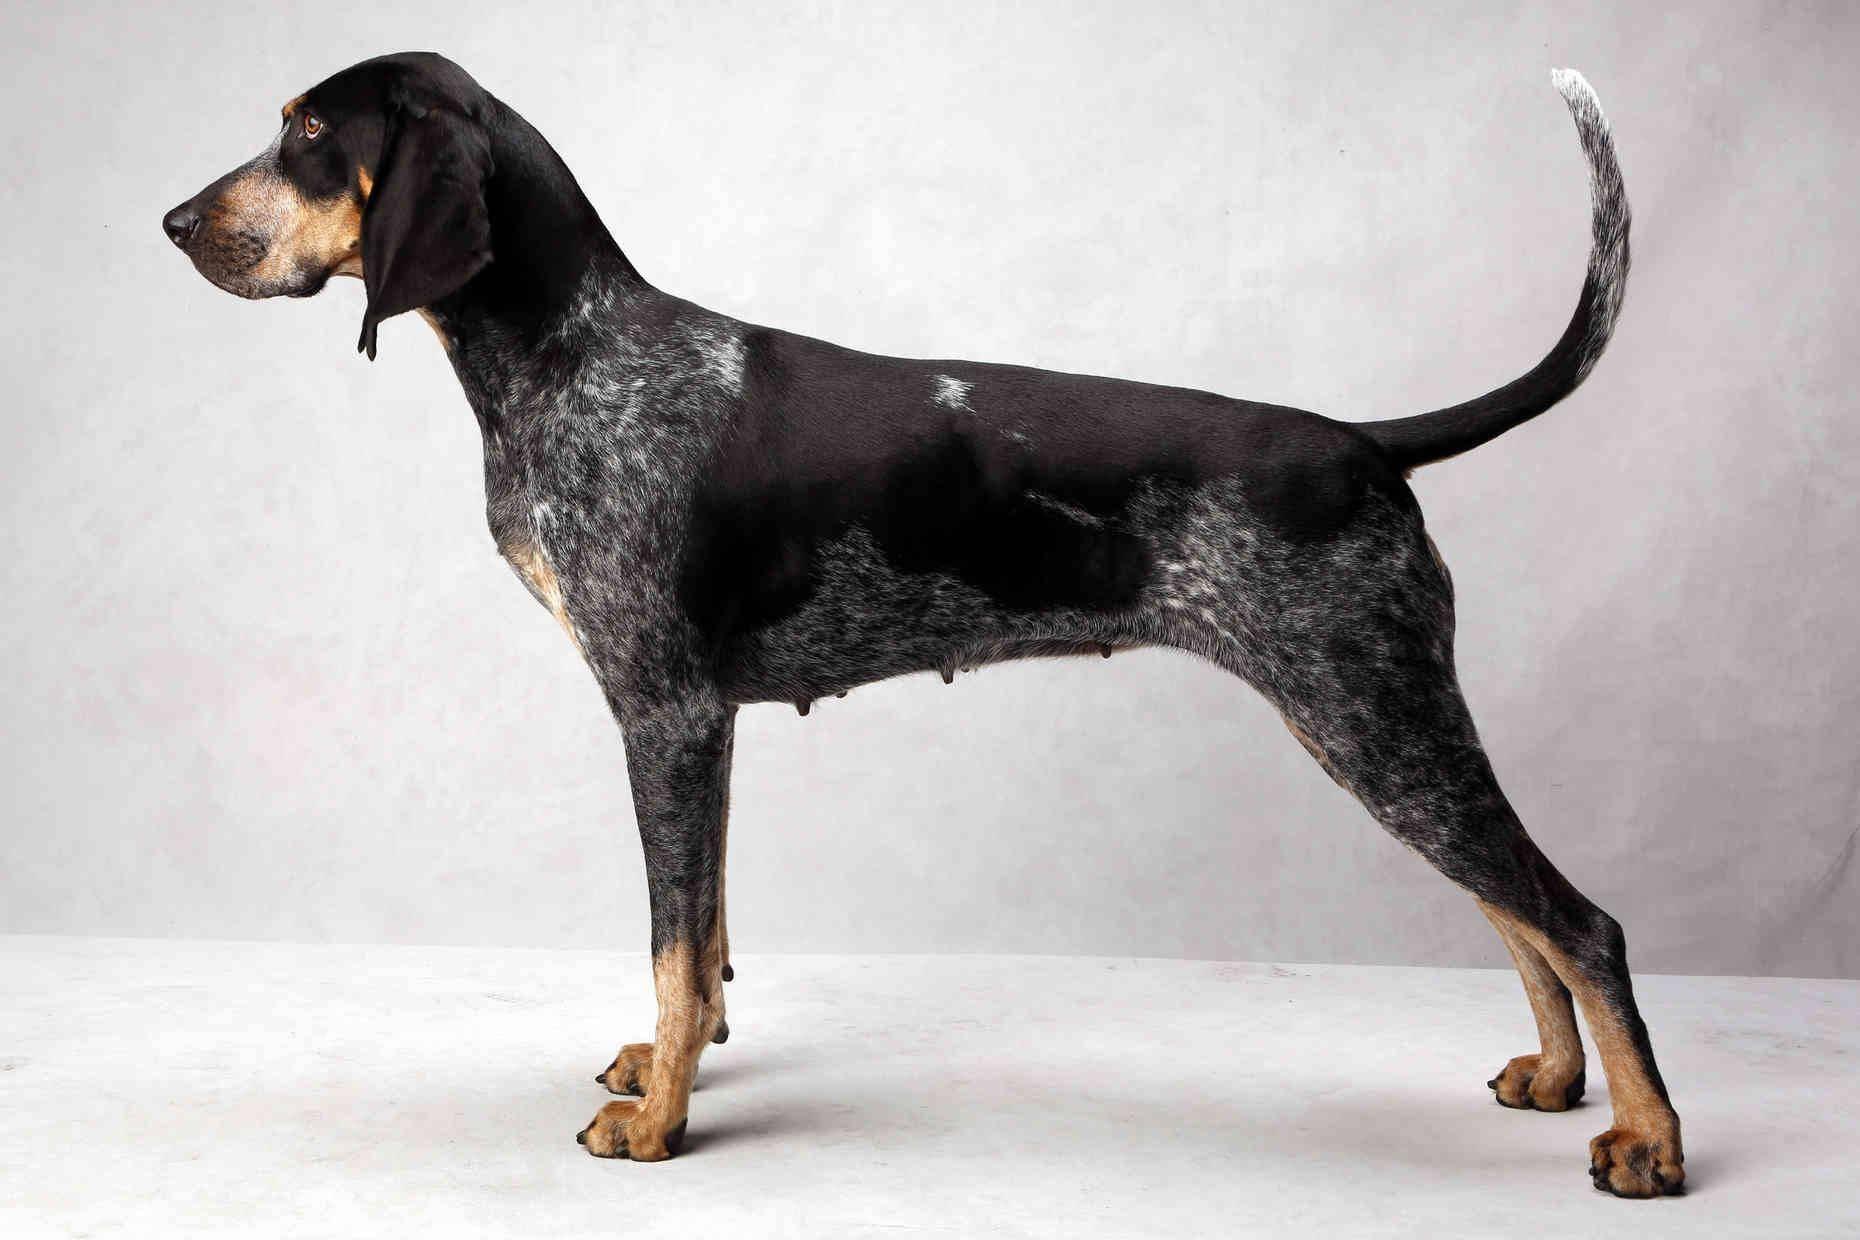 Кунхаунд (енотовая собака): описание породы собак, цена